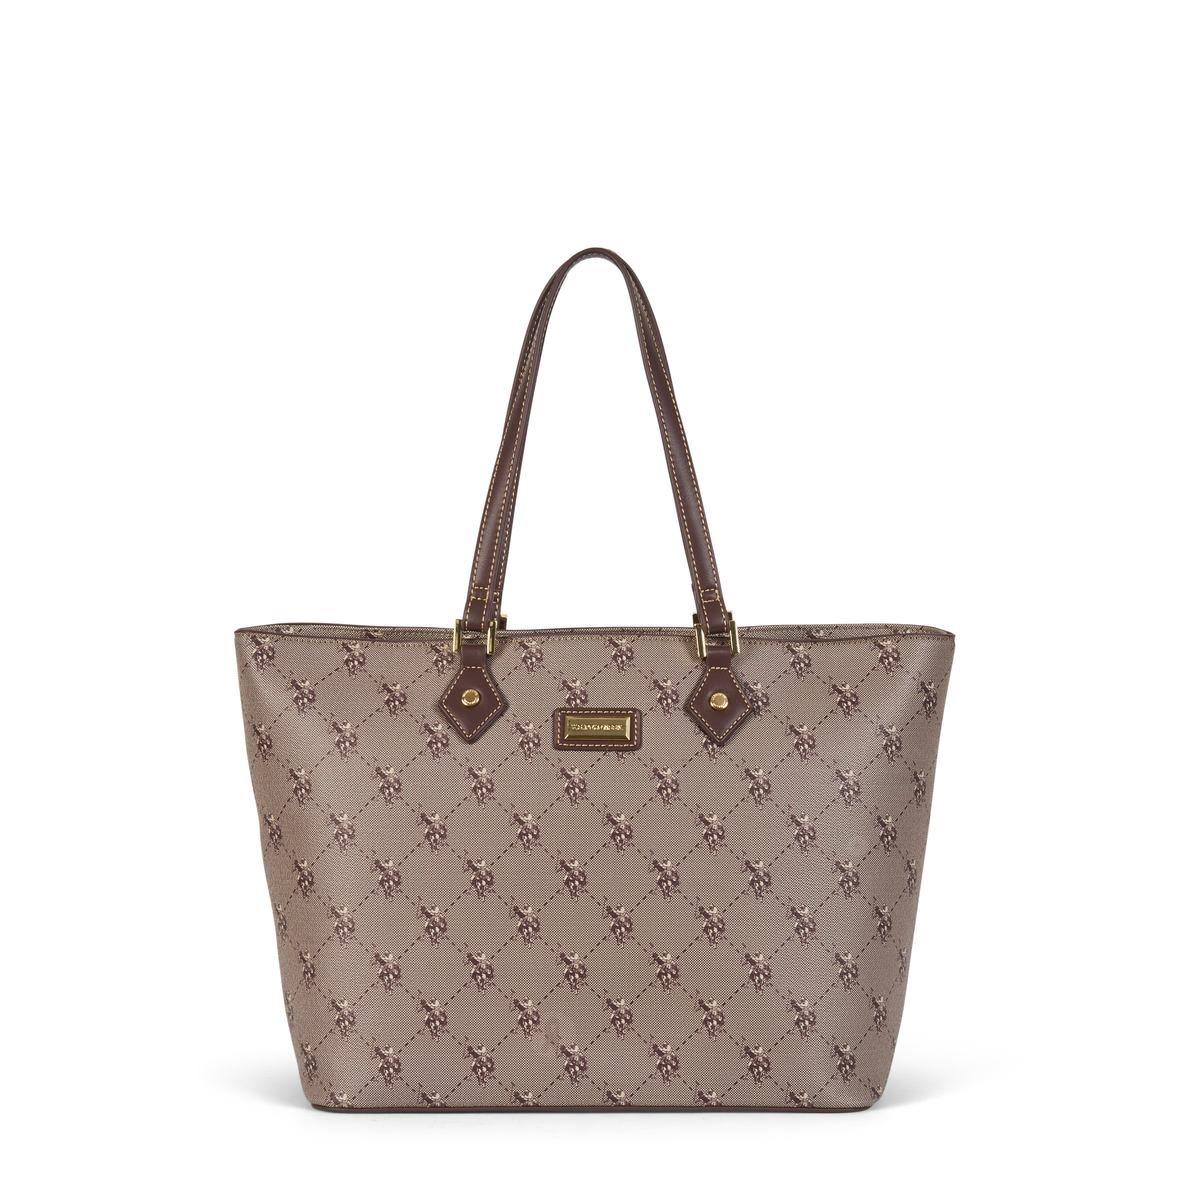 US Polo Assn. Τσάντα χειρός γυναικεία 31.5x14.5x27cm Hampton Brown